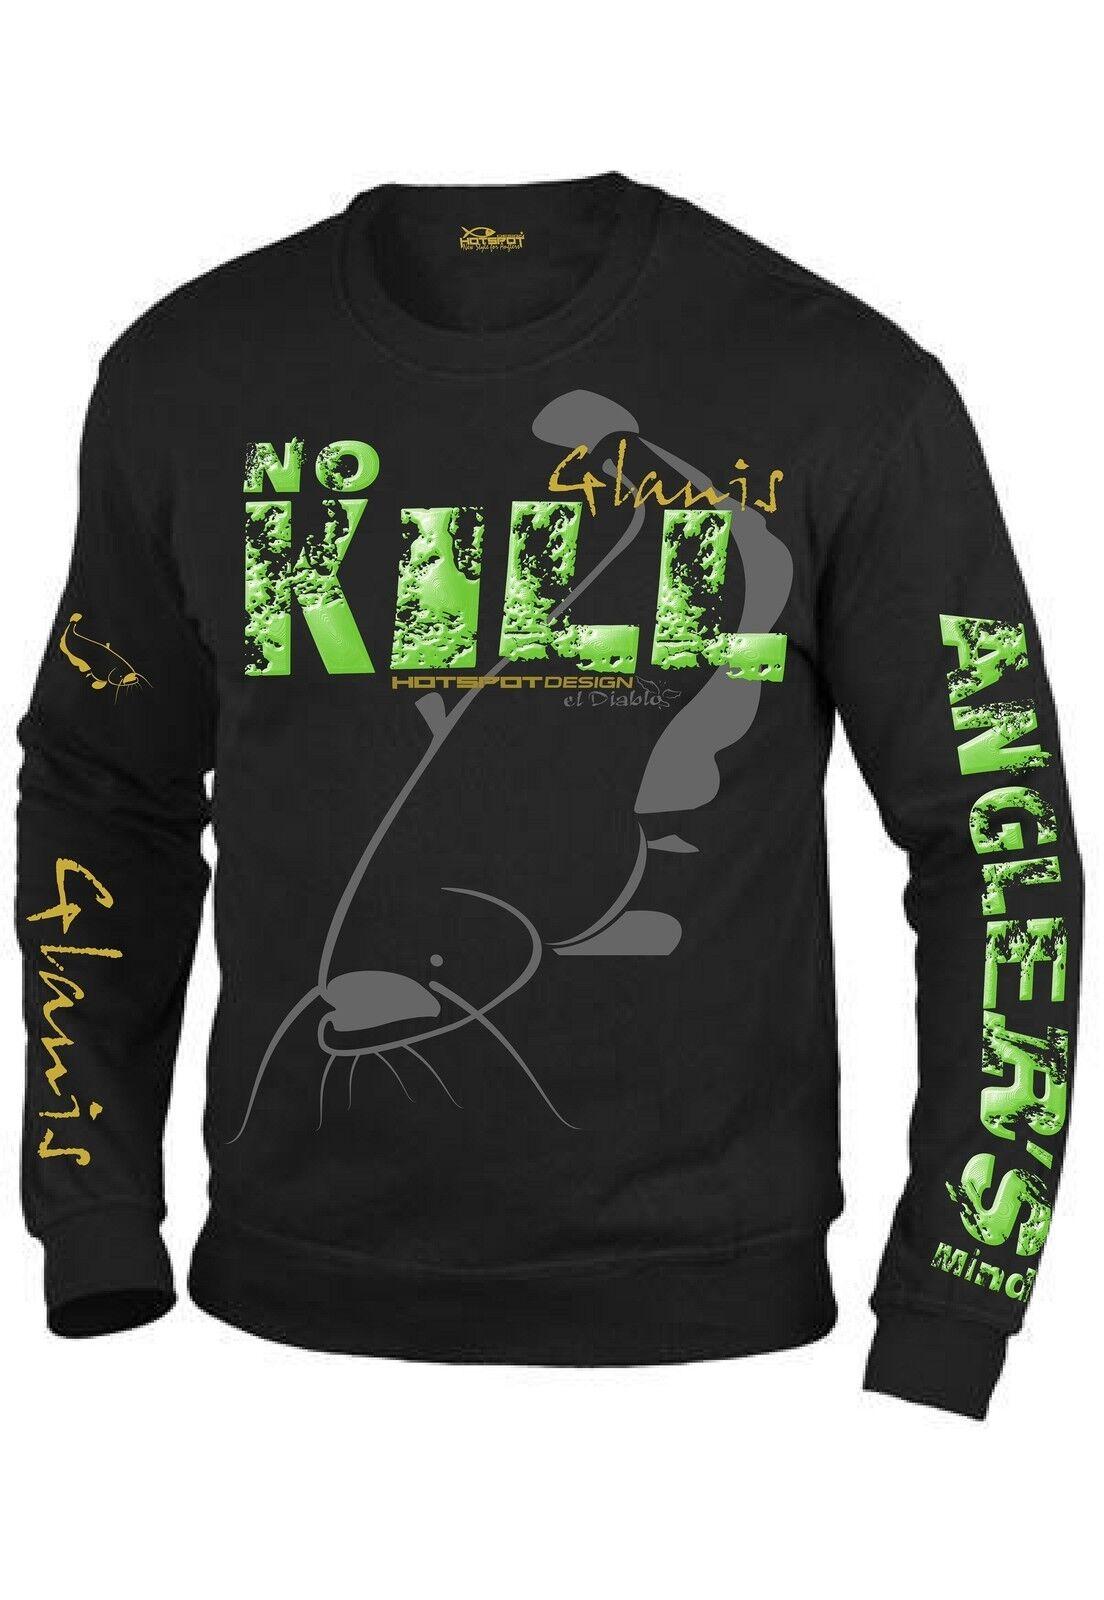 Hotspot Design Sweater   Catfishing , Sweater für Welsangler, F-CAT-00  sale